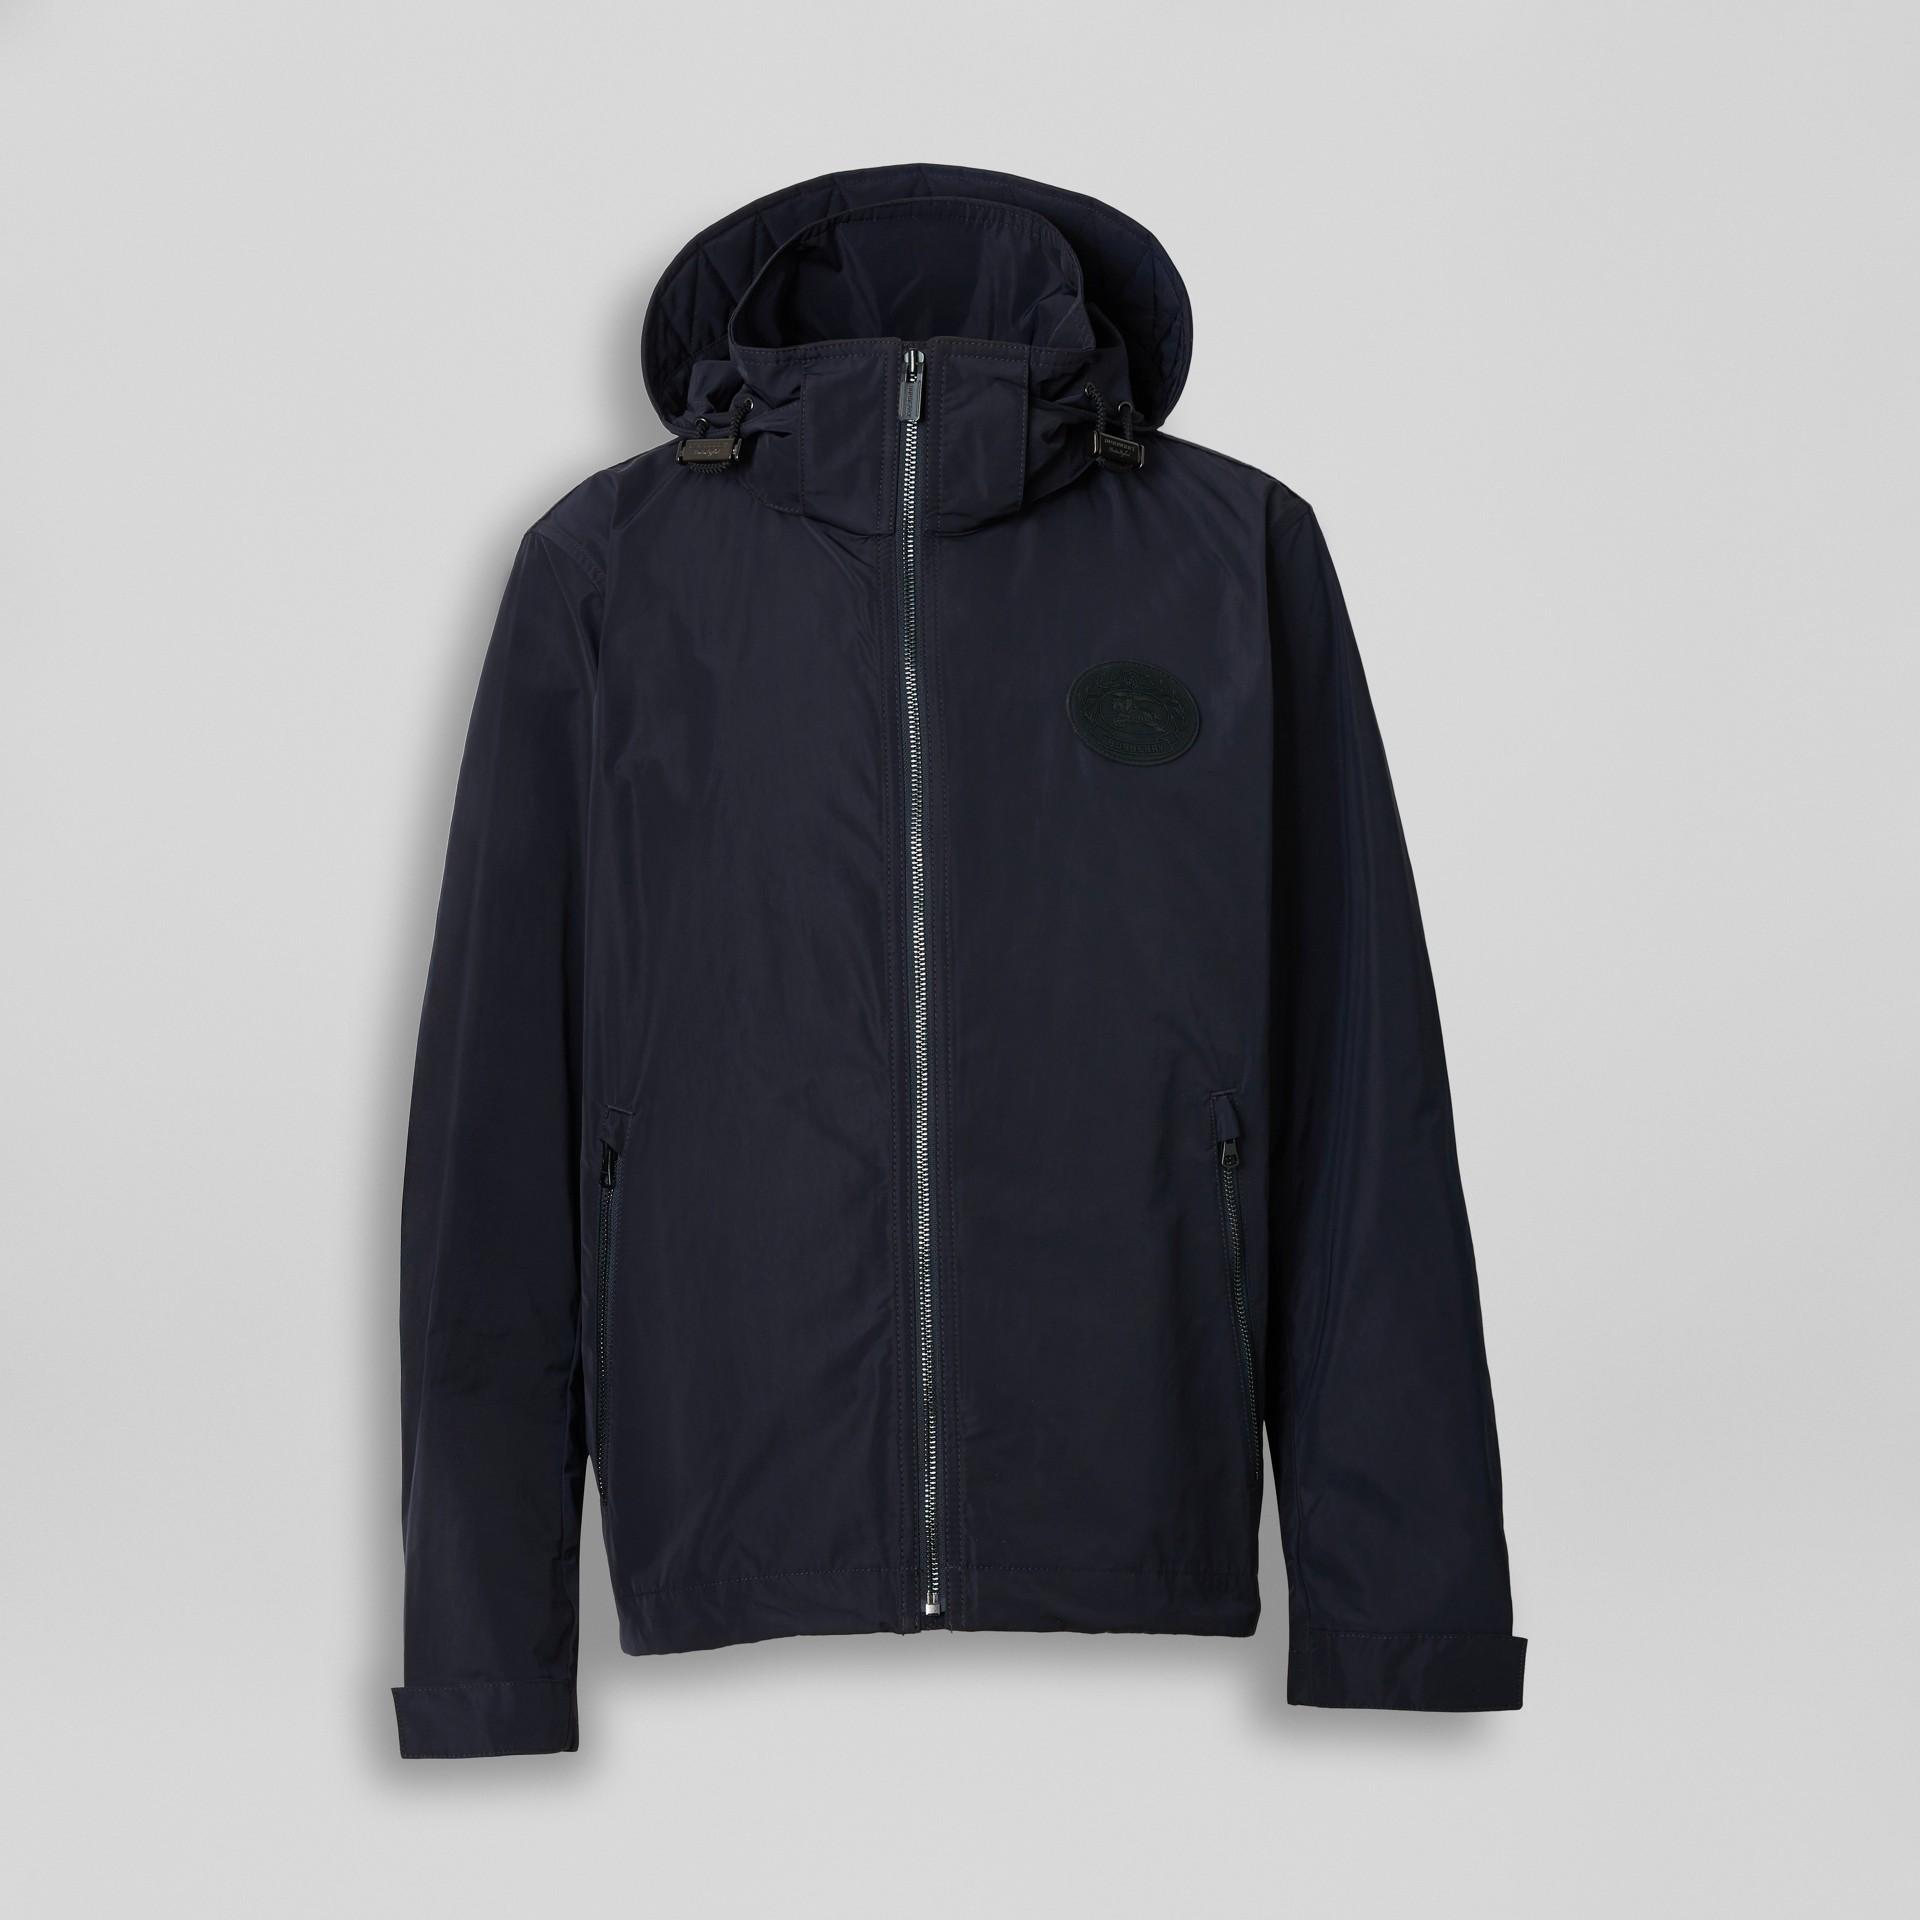 Jacke aus Taft mit Memory-Effekt und packbarer Kapuze (Tintenblau) - Herren | Burberry - Galerie-Bild 2